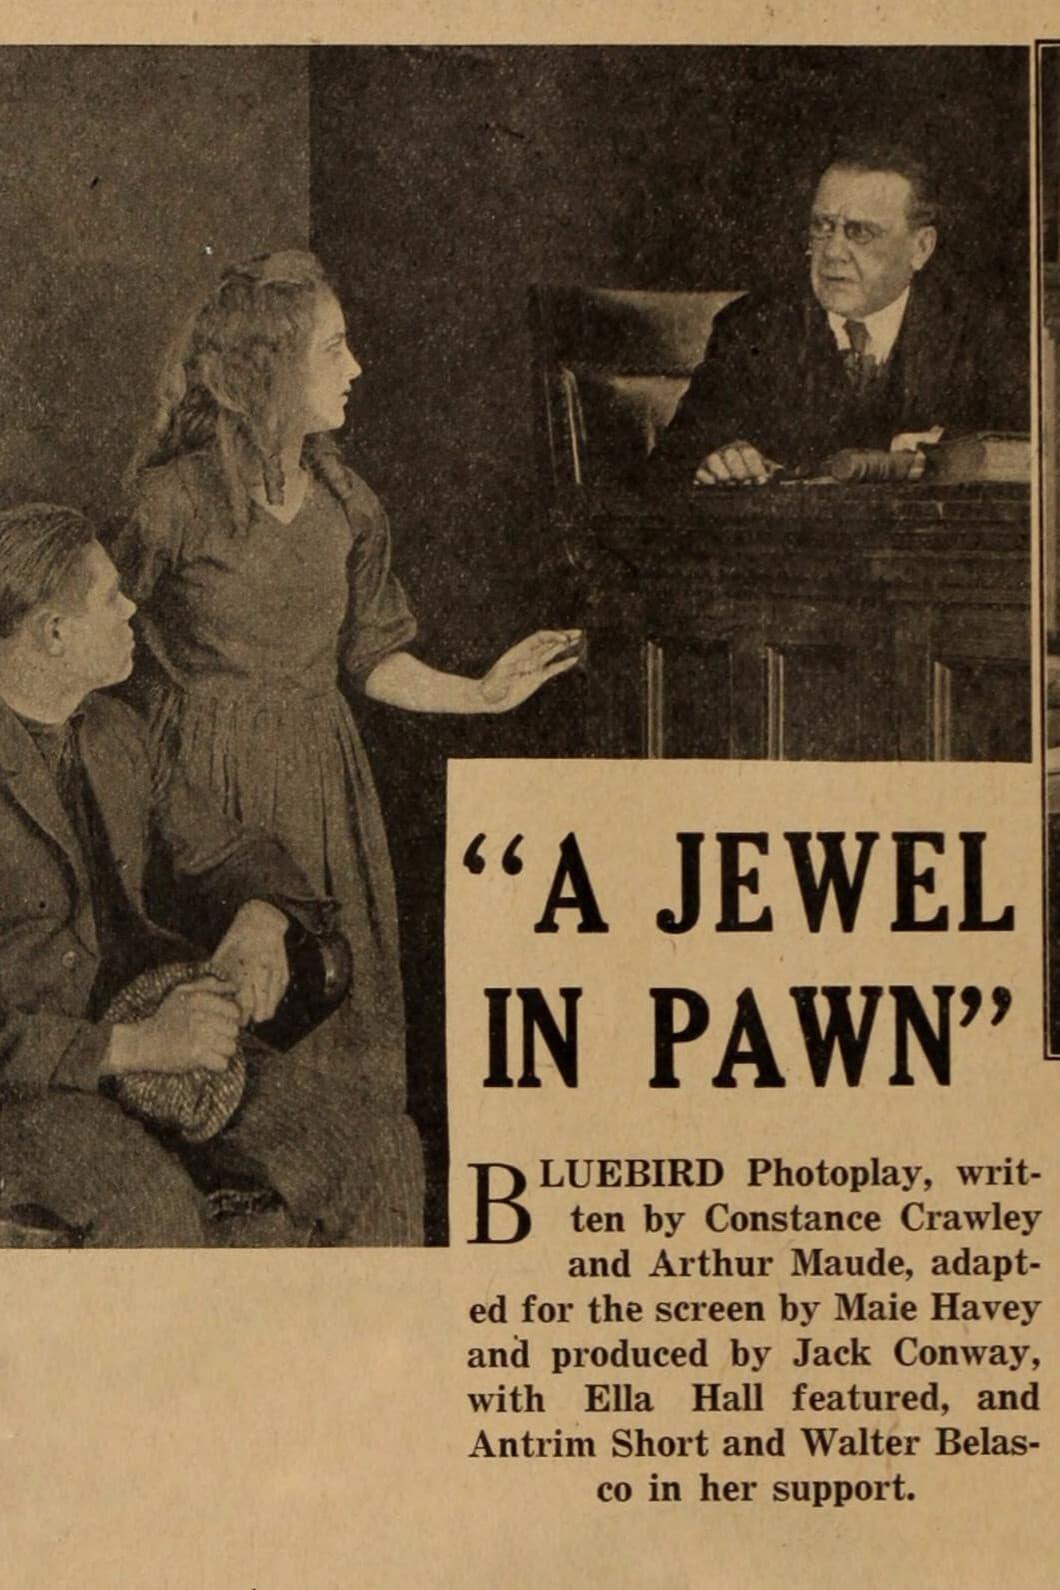 A Jewel in Pawn